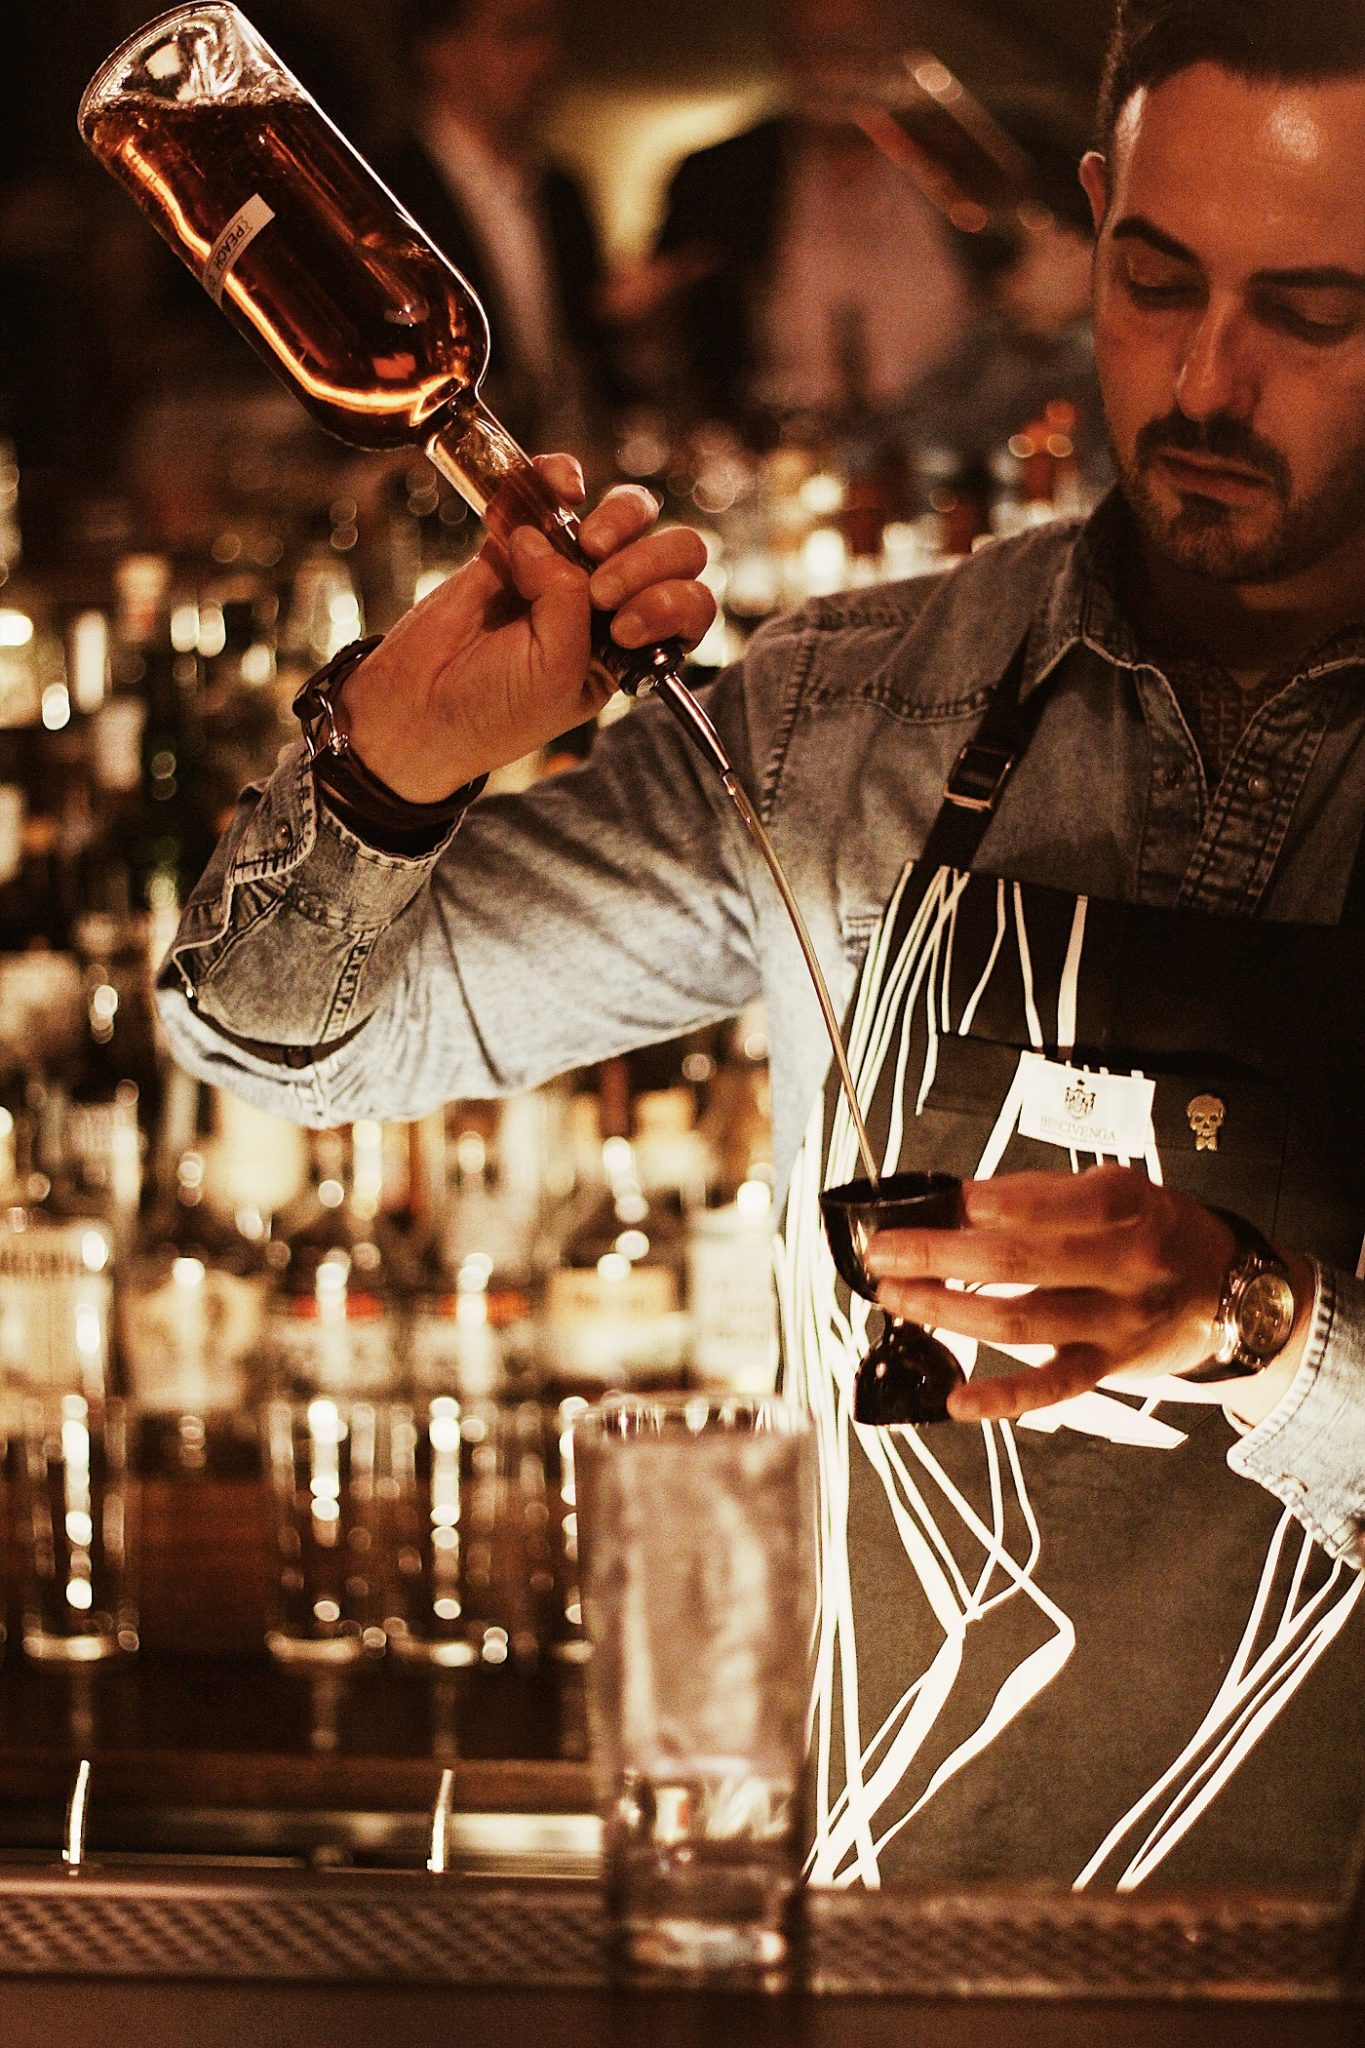 I distillati francesi Cognac Hine, Armagnac Janneau e Calvados Boulardpresentati presso Oblio di Milano